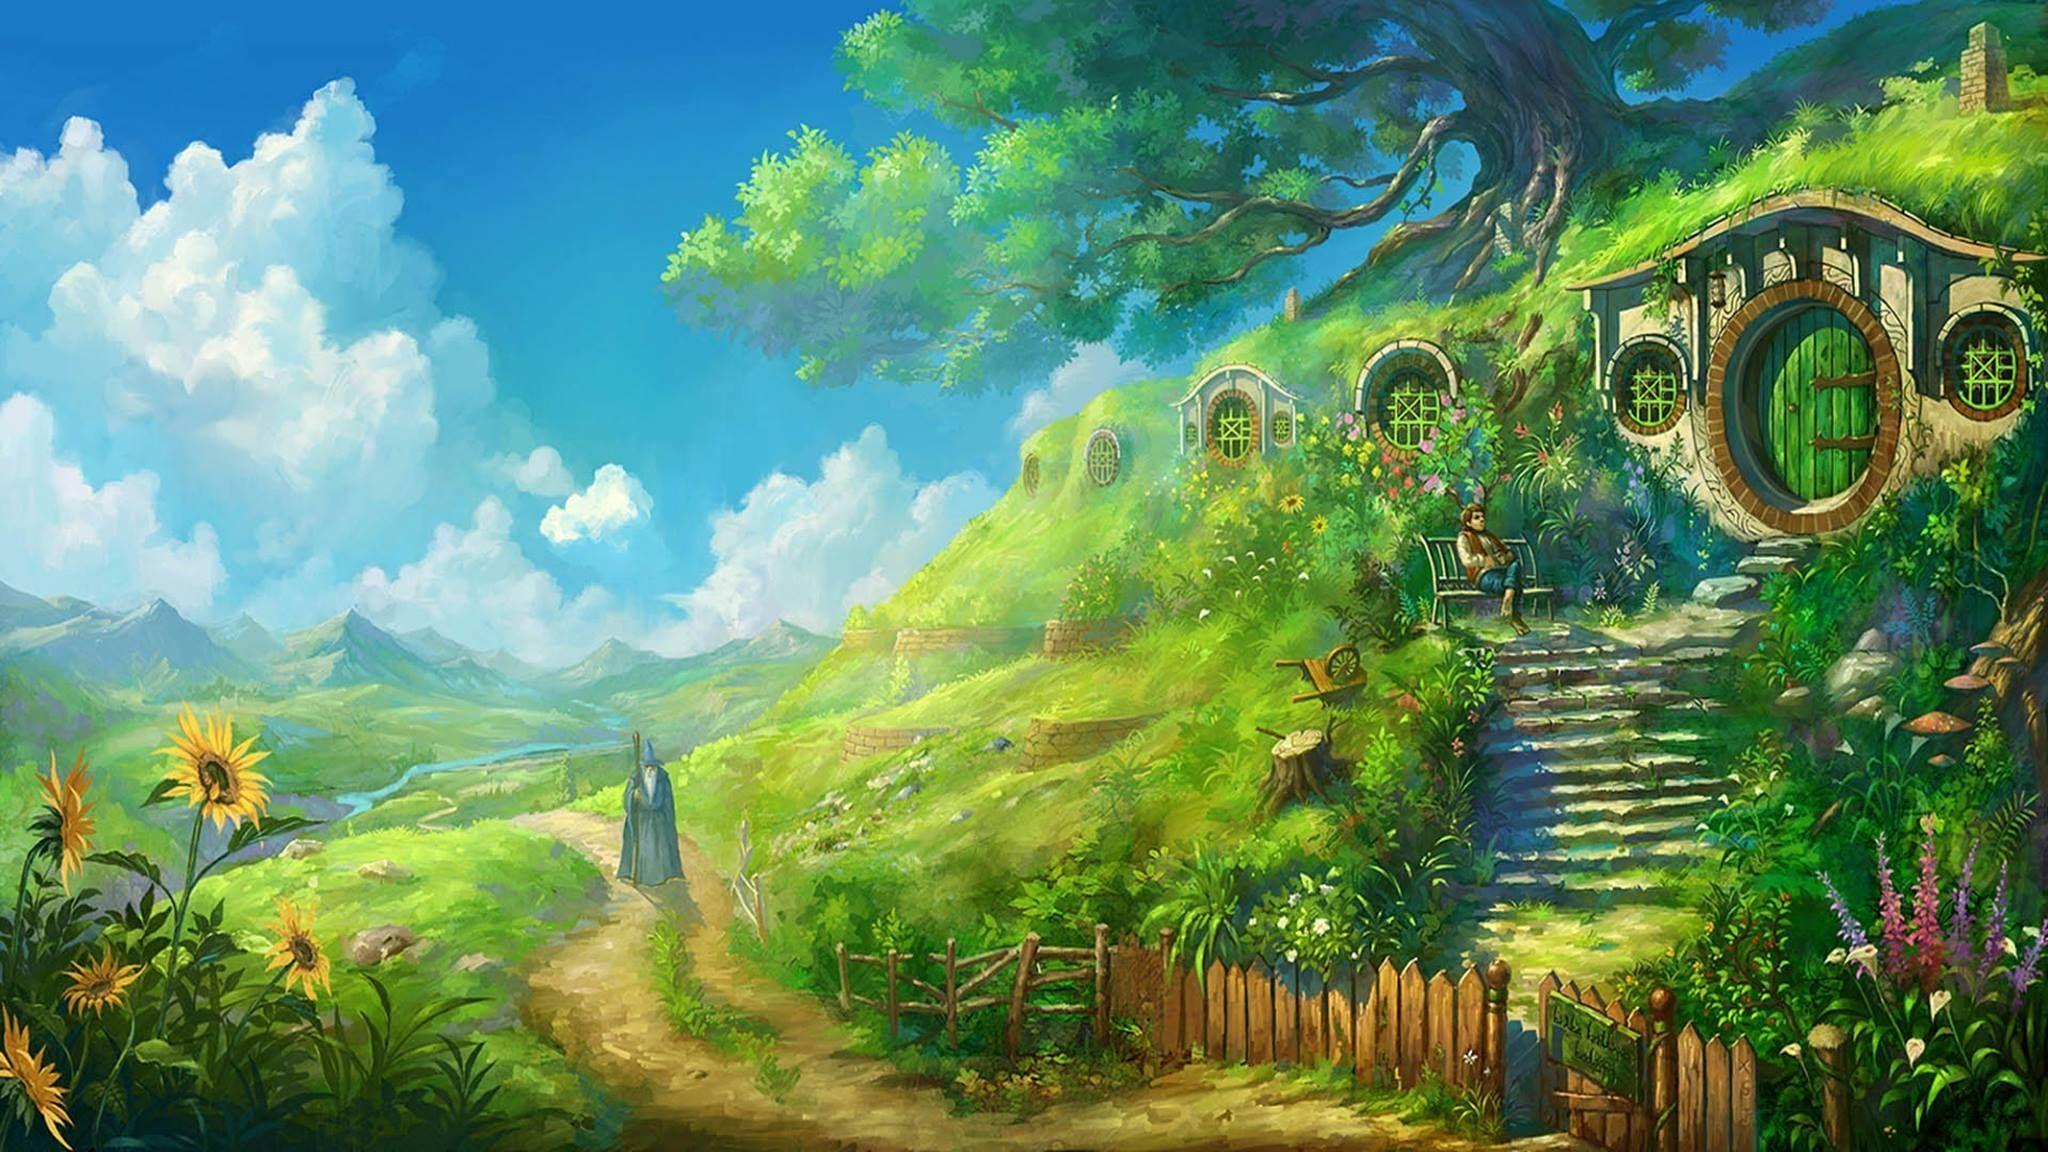 Studio Ghibli Desktop Wallpapers Top Free Studio Ghibli